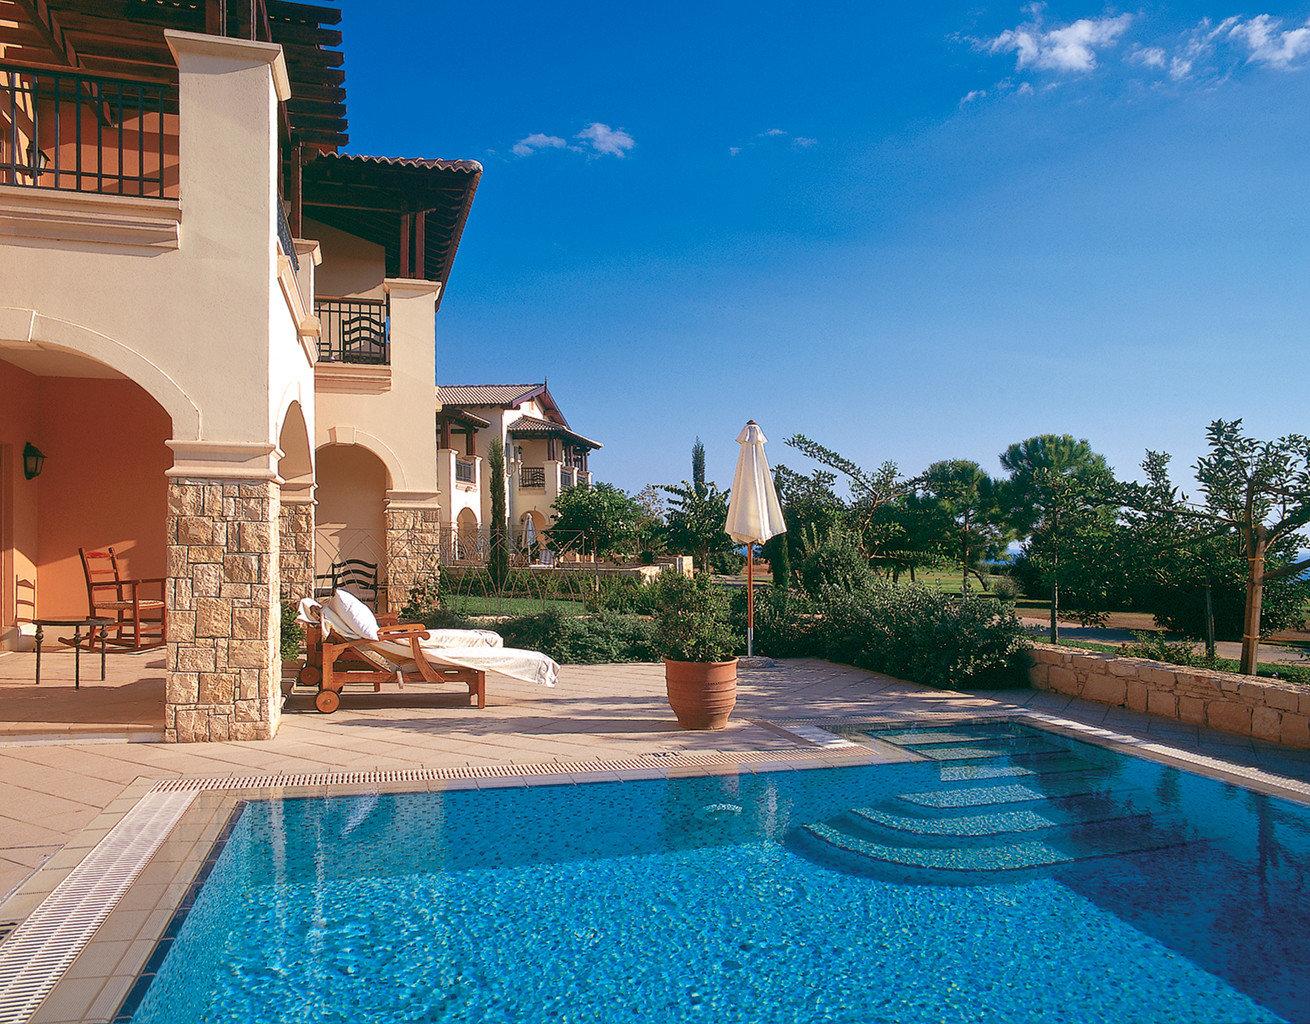 Family Luxury Pool Resort Scenic views Waterfront Wellness sky swimming pool property building Villa house home mansion backyard condominium hacienda swimming